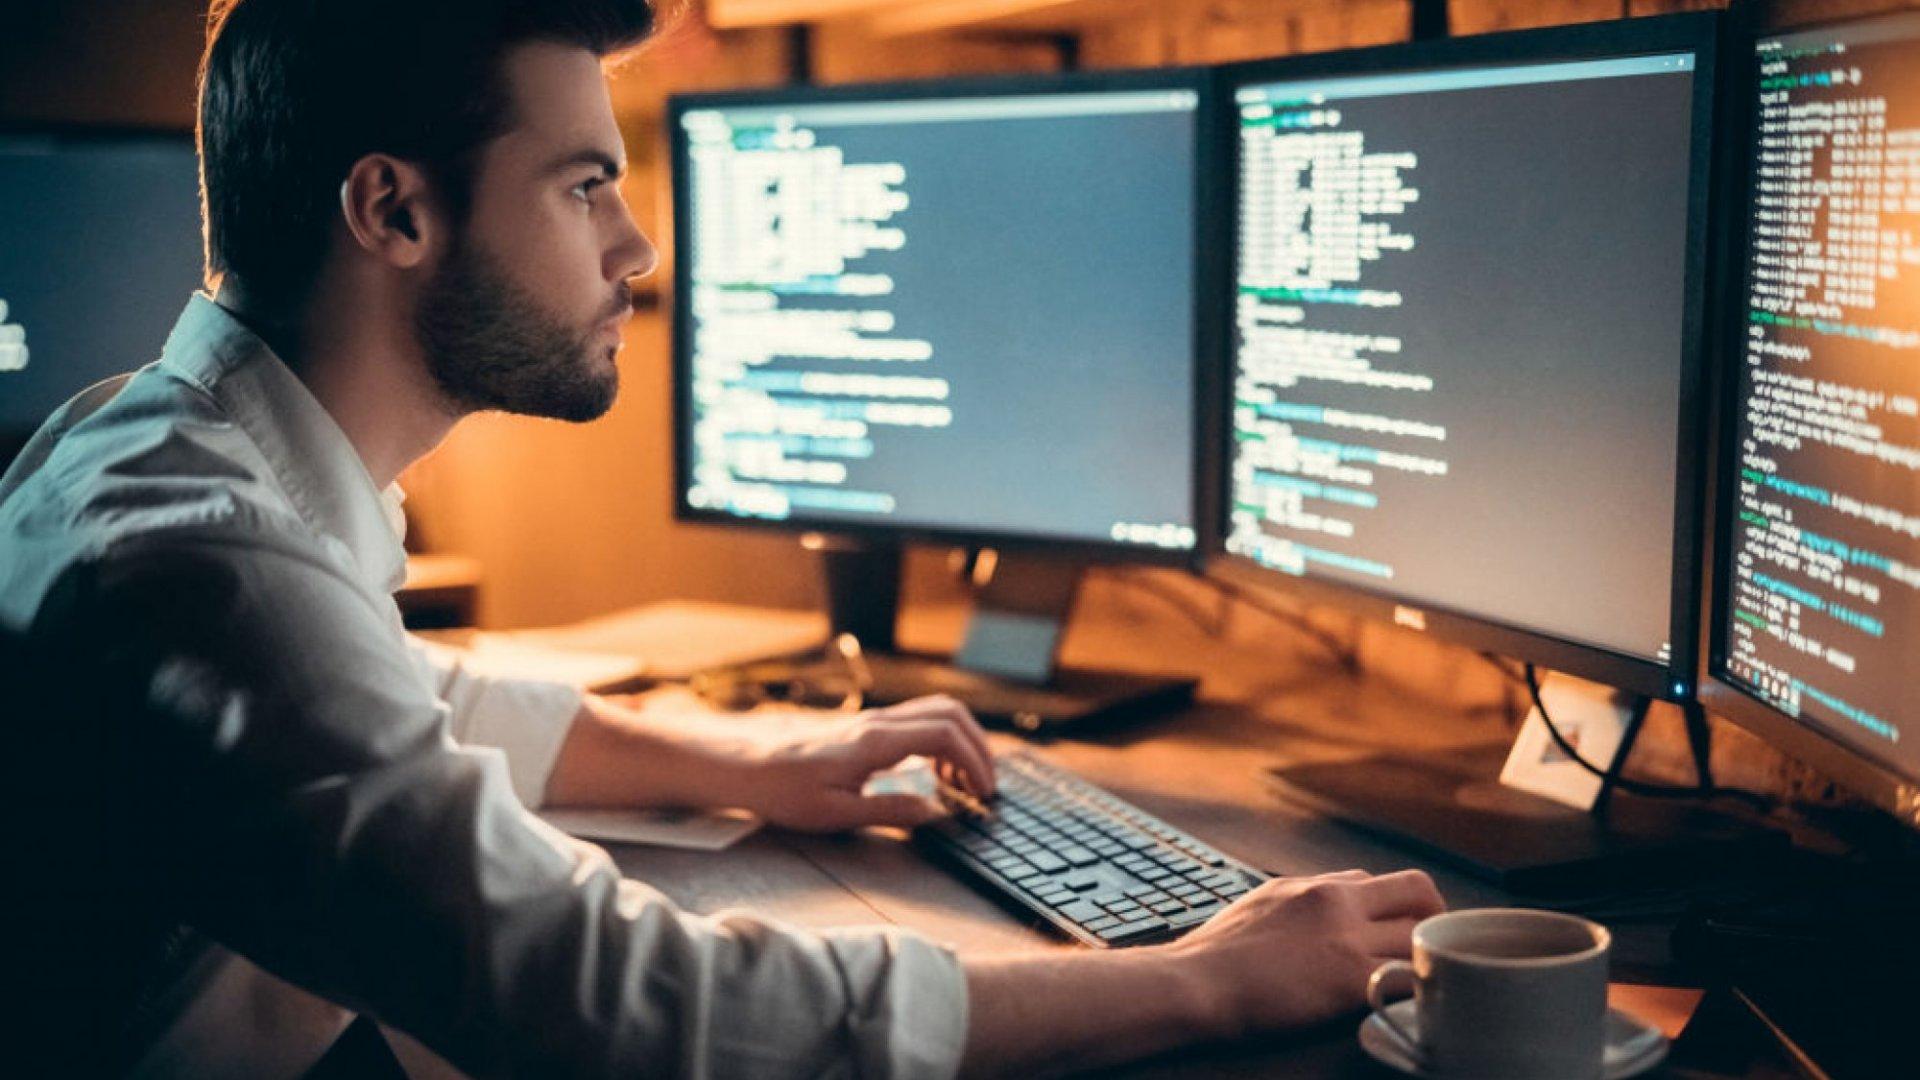 4 Fundamental Principles for Great Software Development